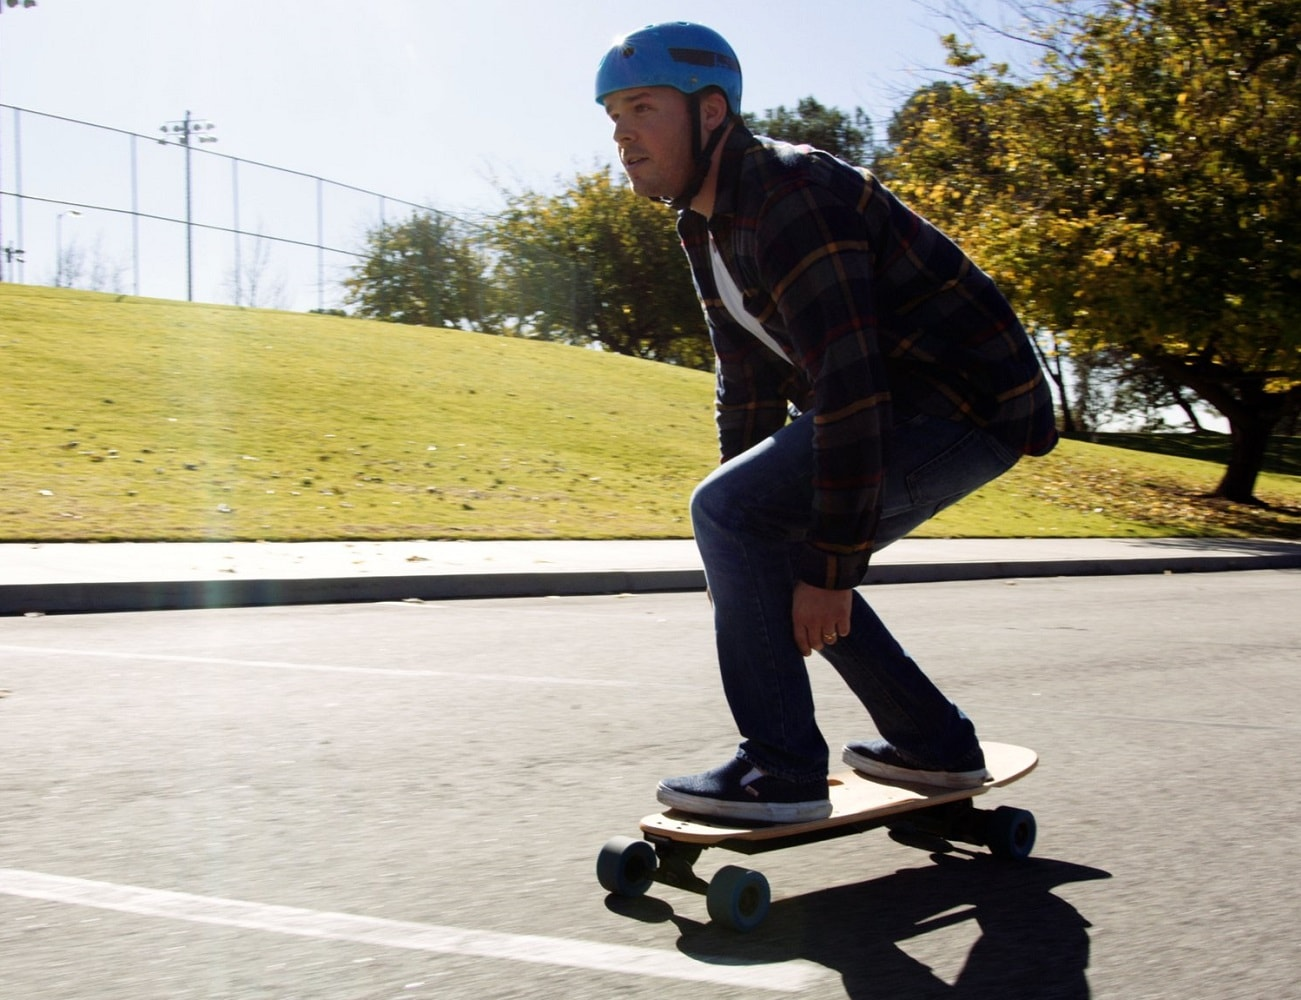 ZBoard 2: The Most Advanced Electric Skateboard